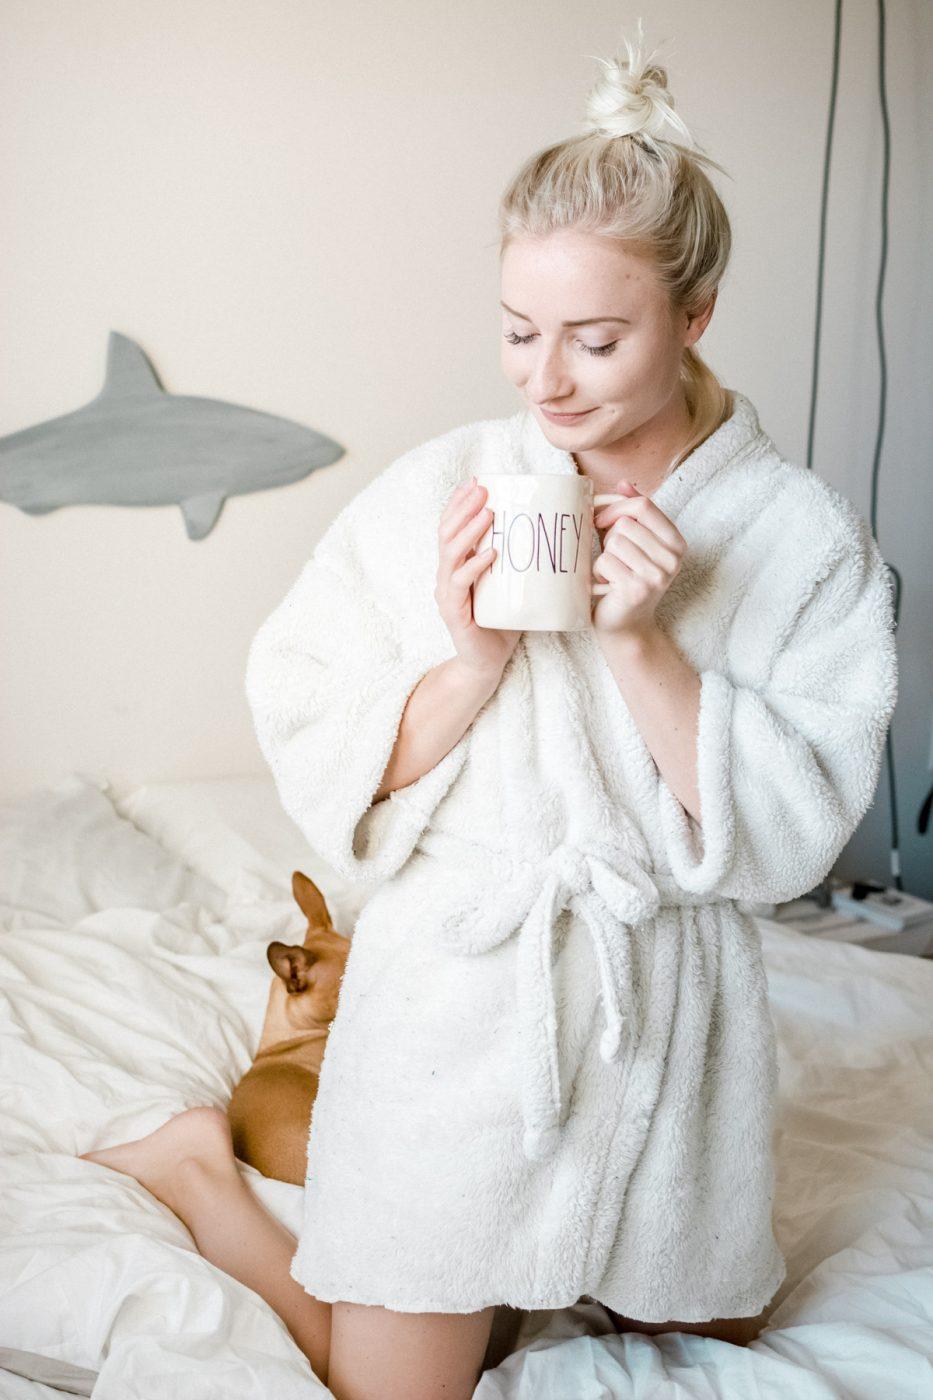 DIY Bathrobe From A Blanket - Sweet Teal